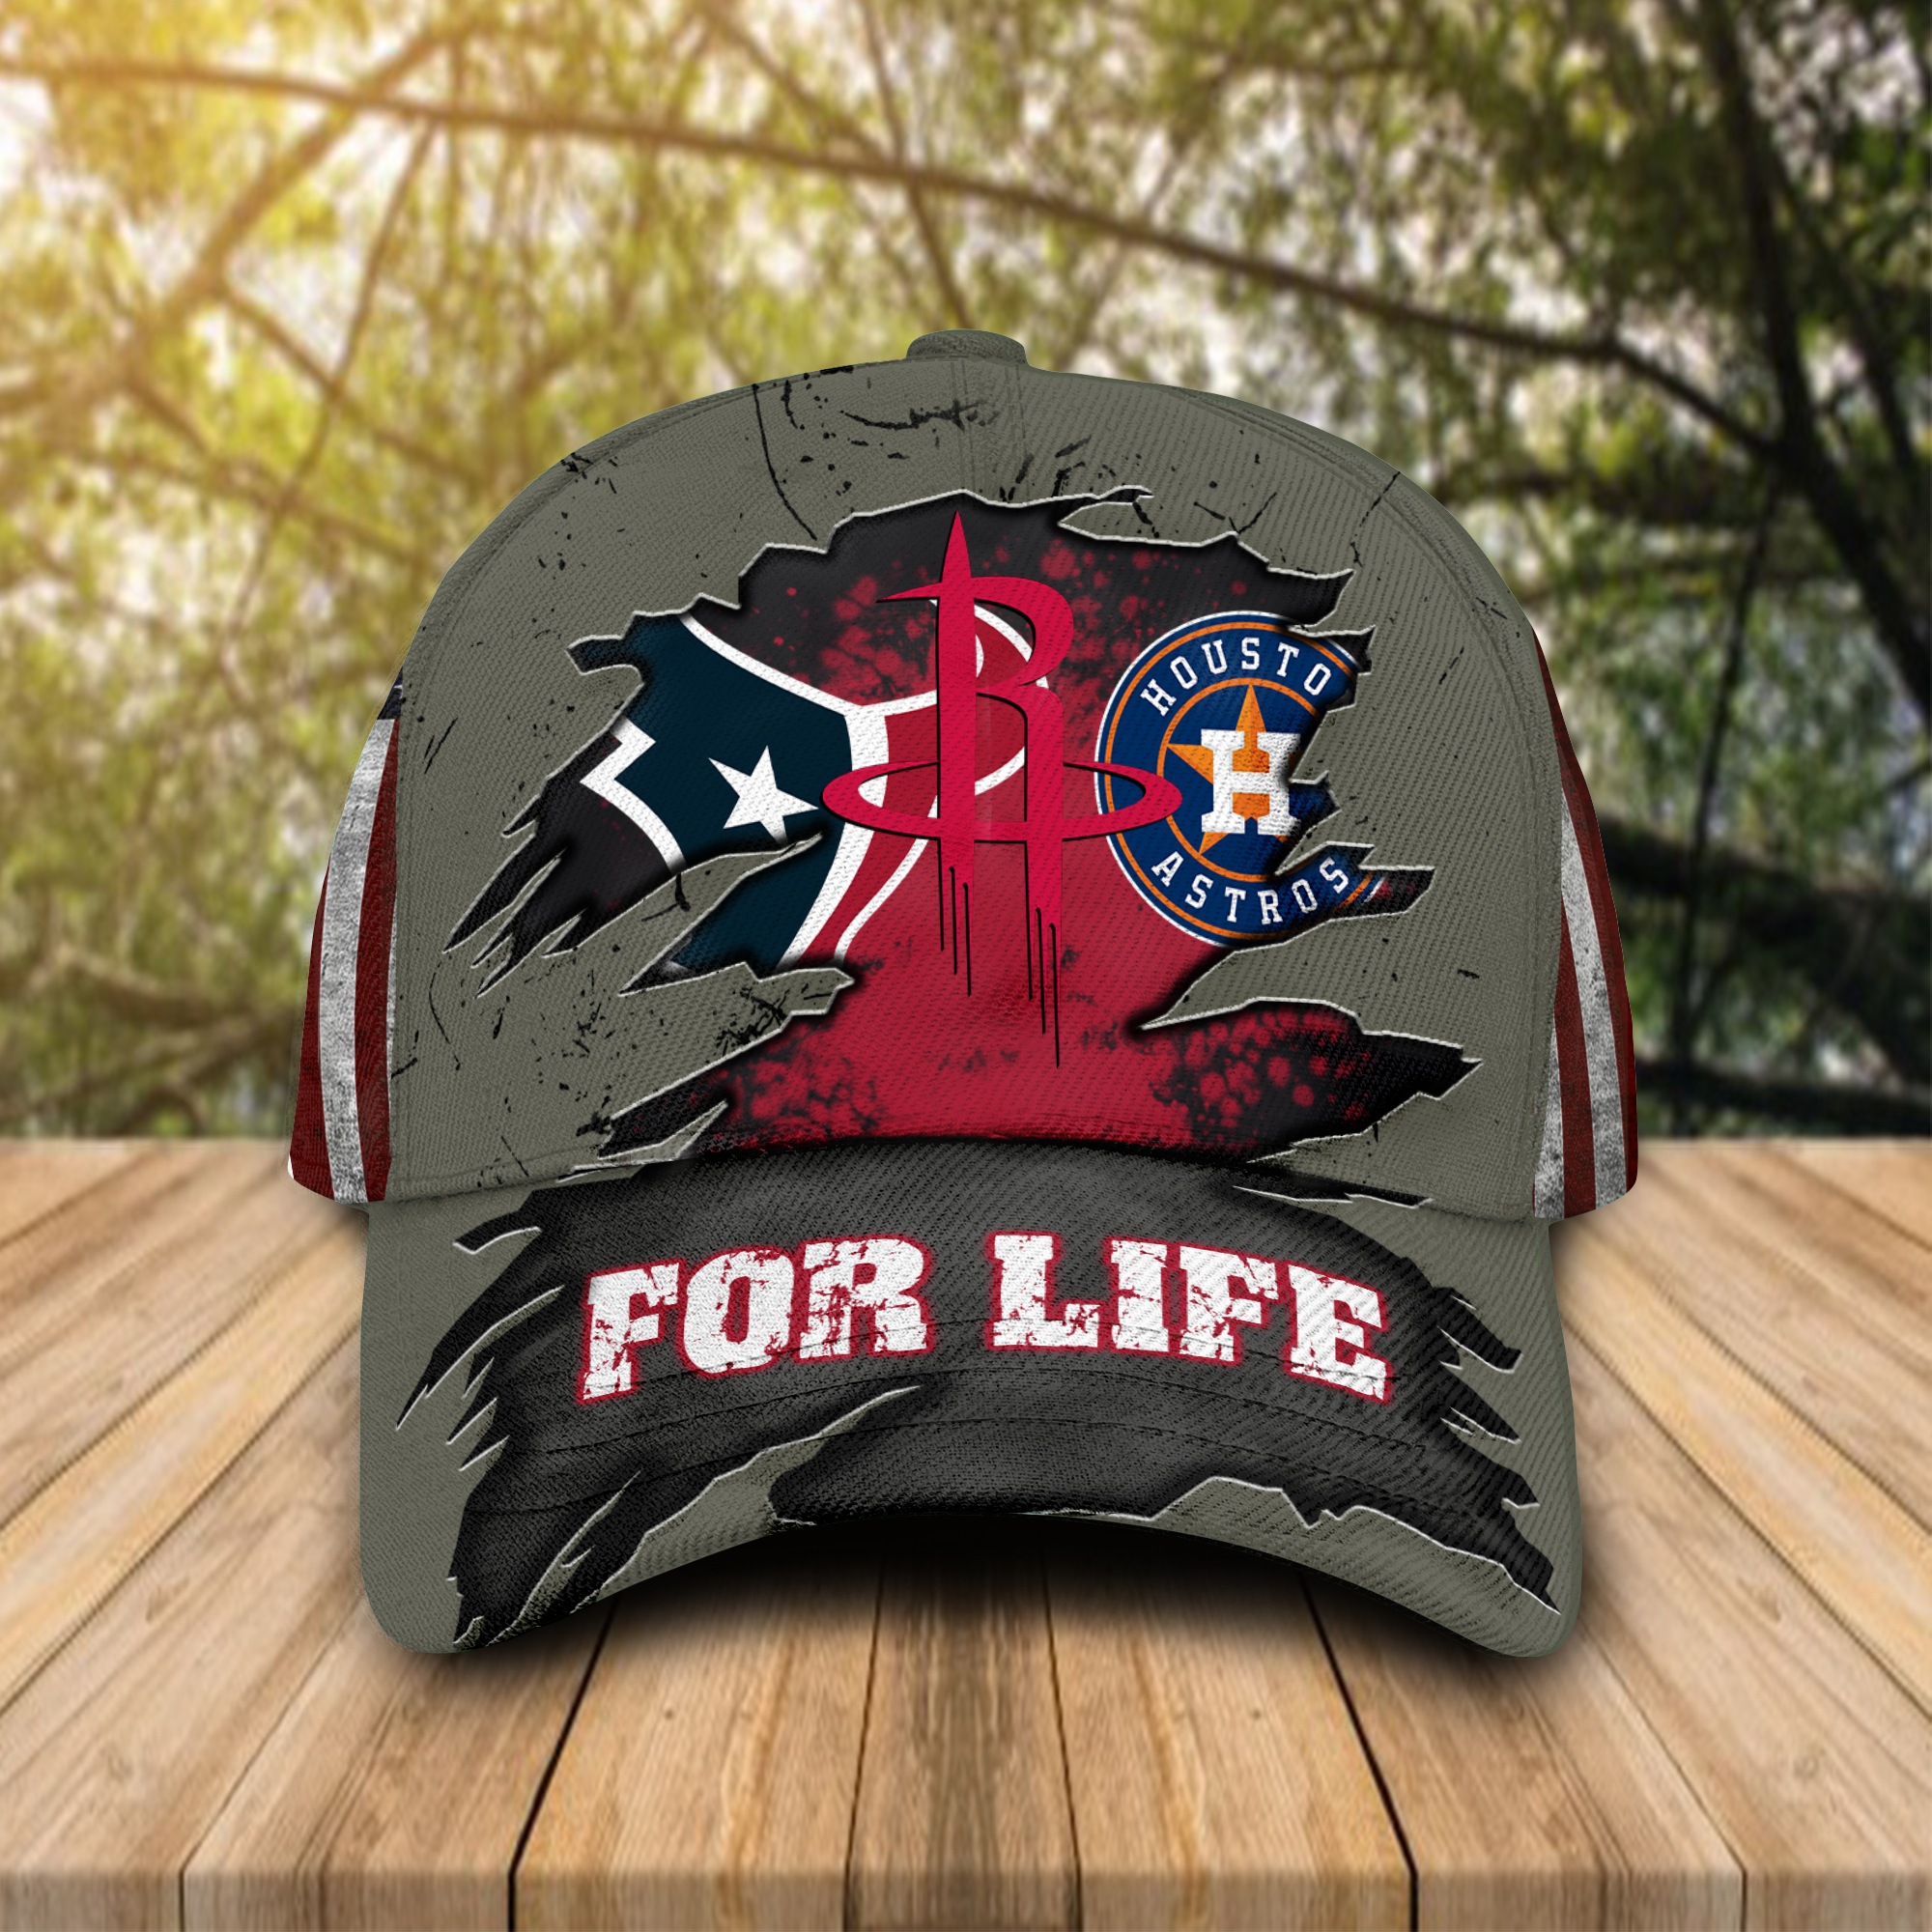 Houston Texans Houston Astros Houston Rockets For Life cap hat 1